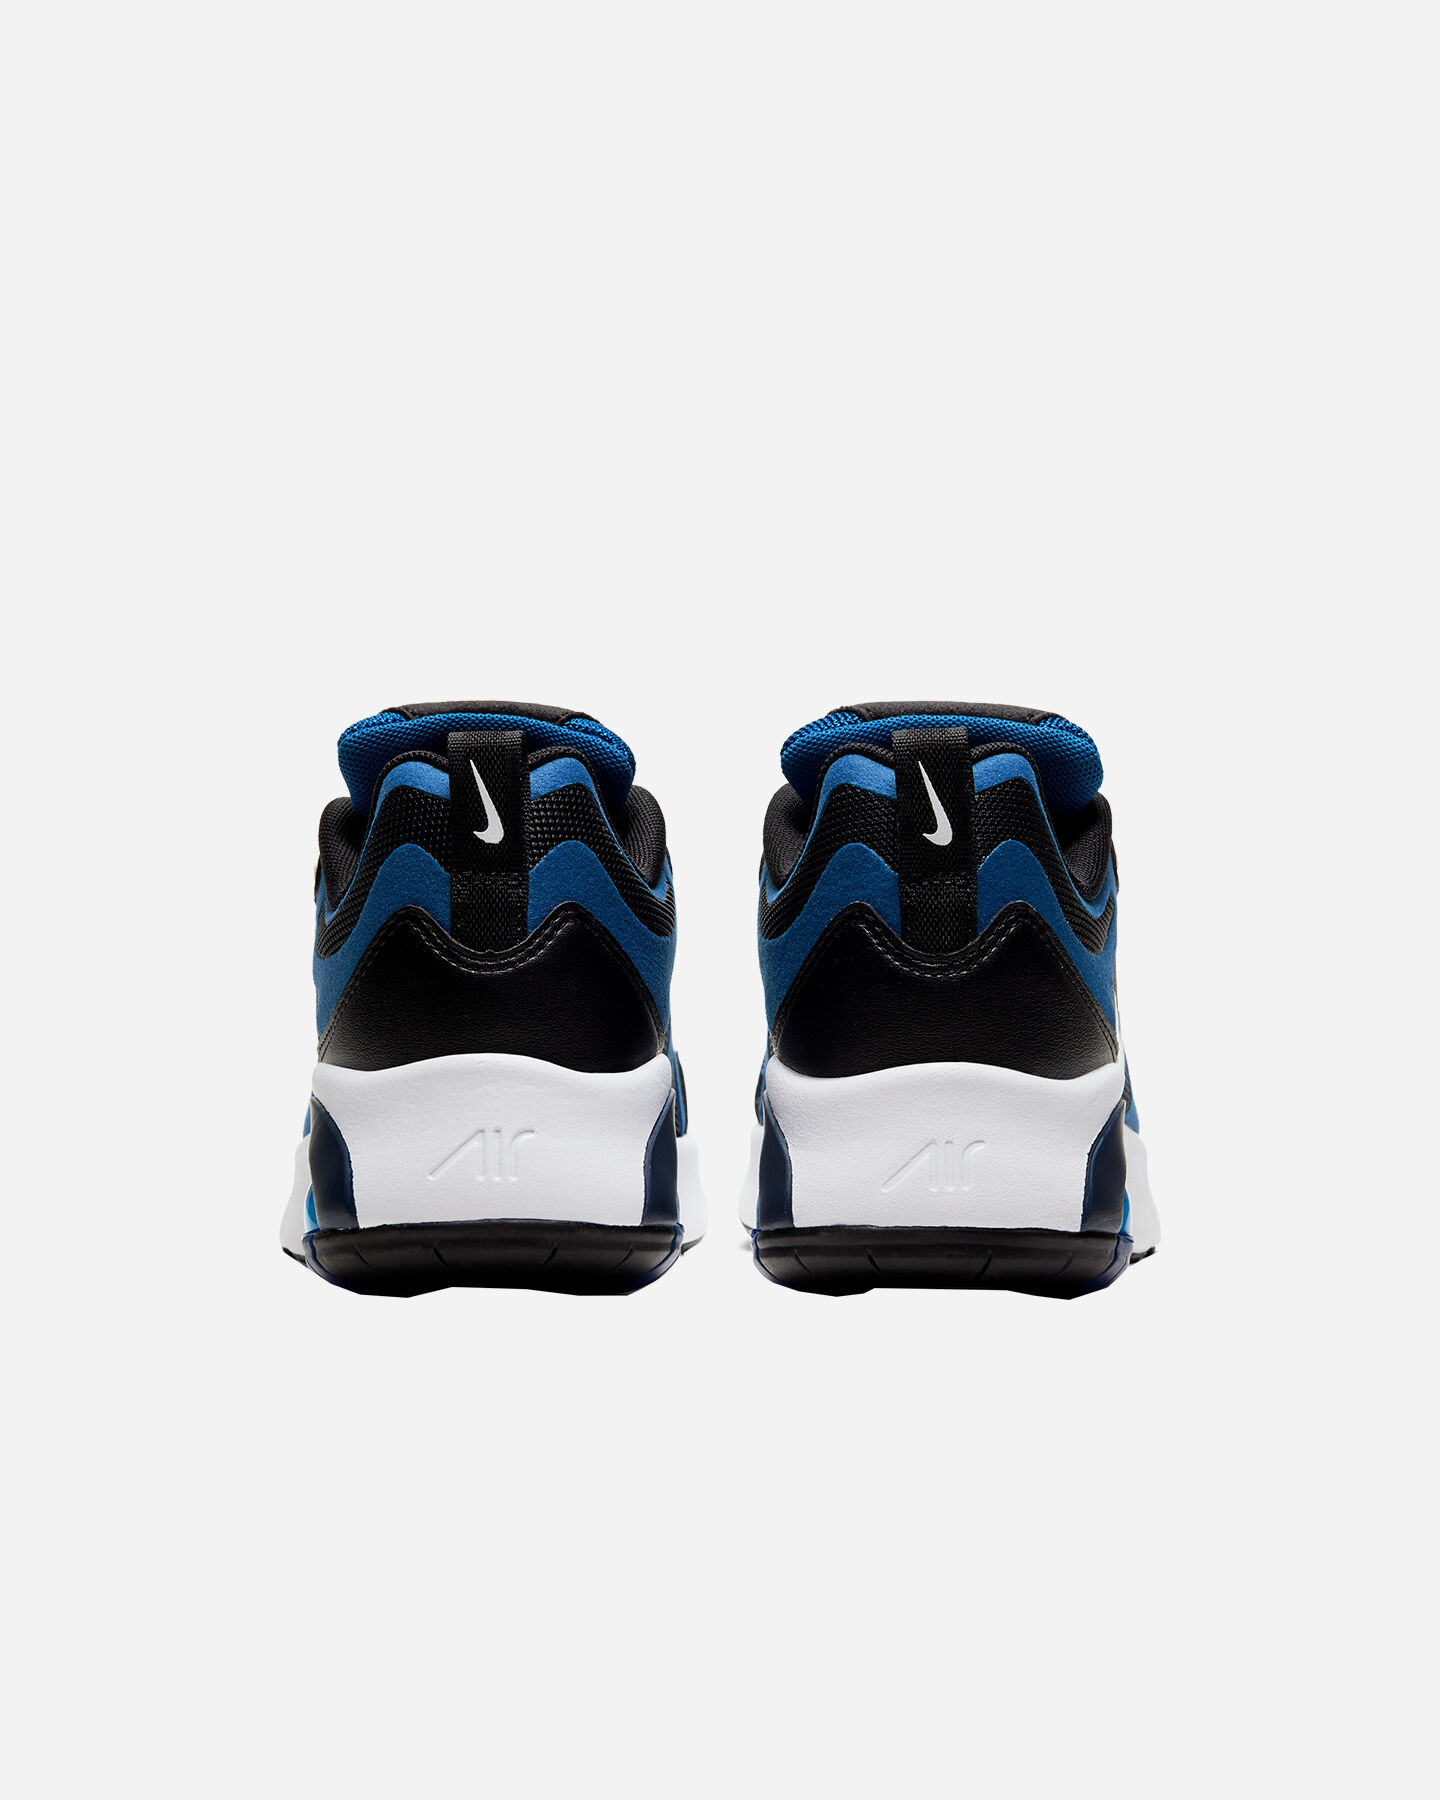 Scarpe sneakers NIKE AIR MAX 200 GS JR S5161546 scatto 4